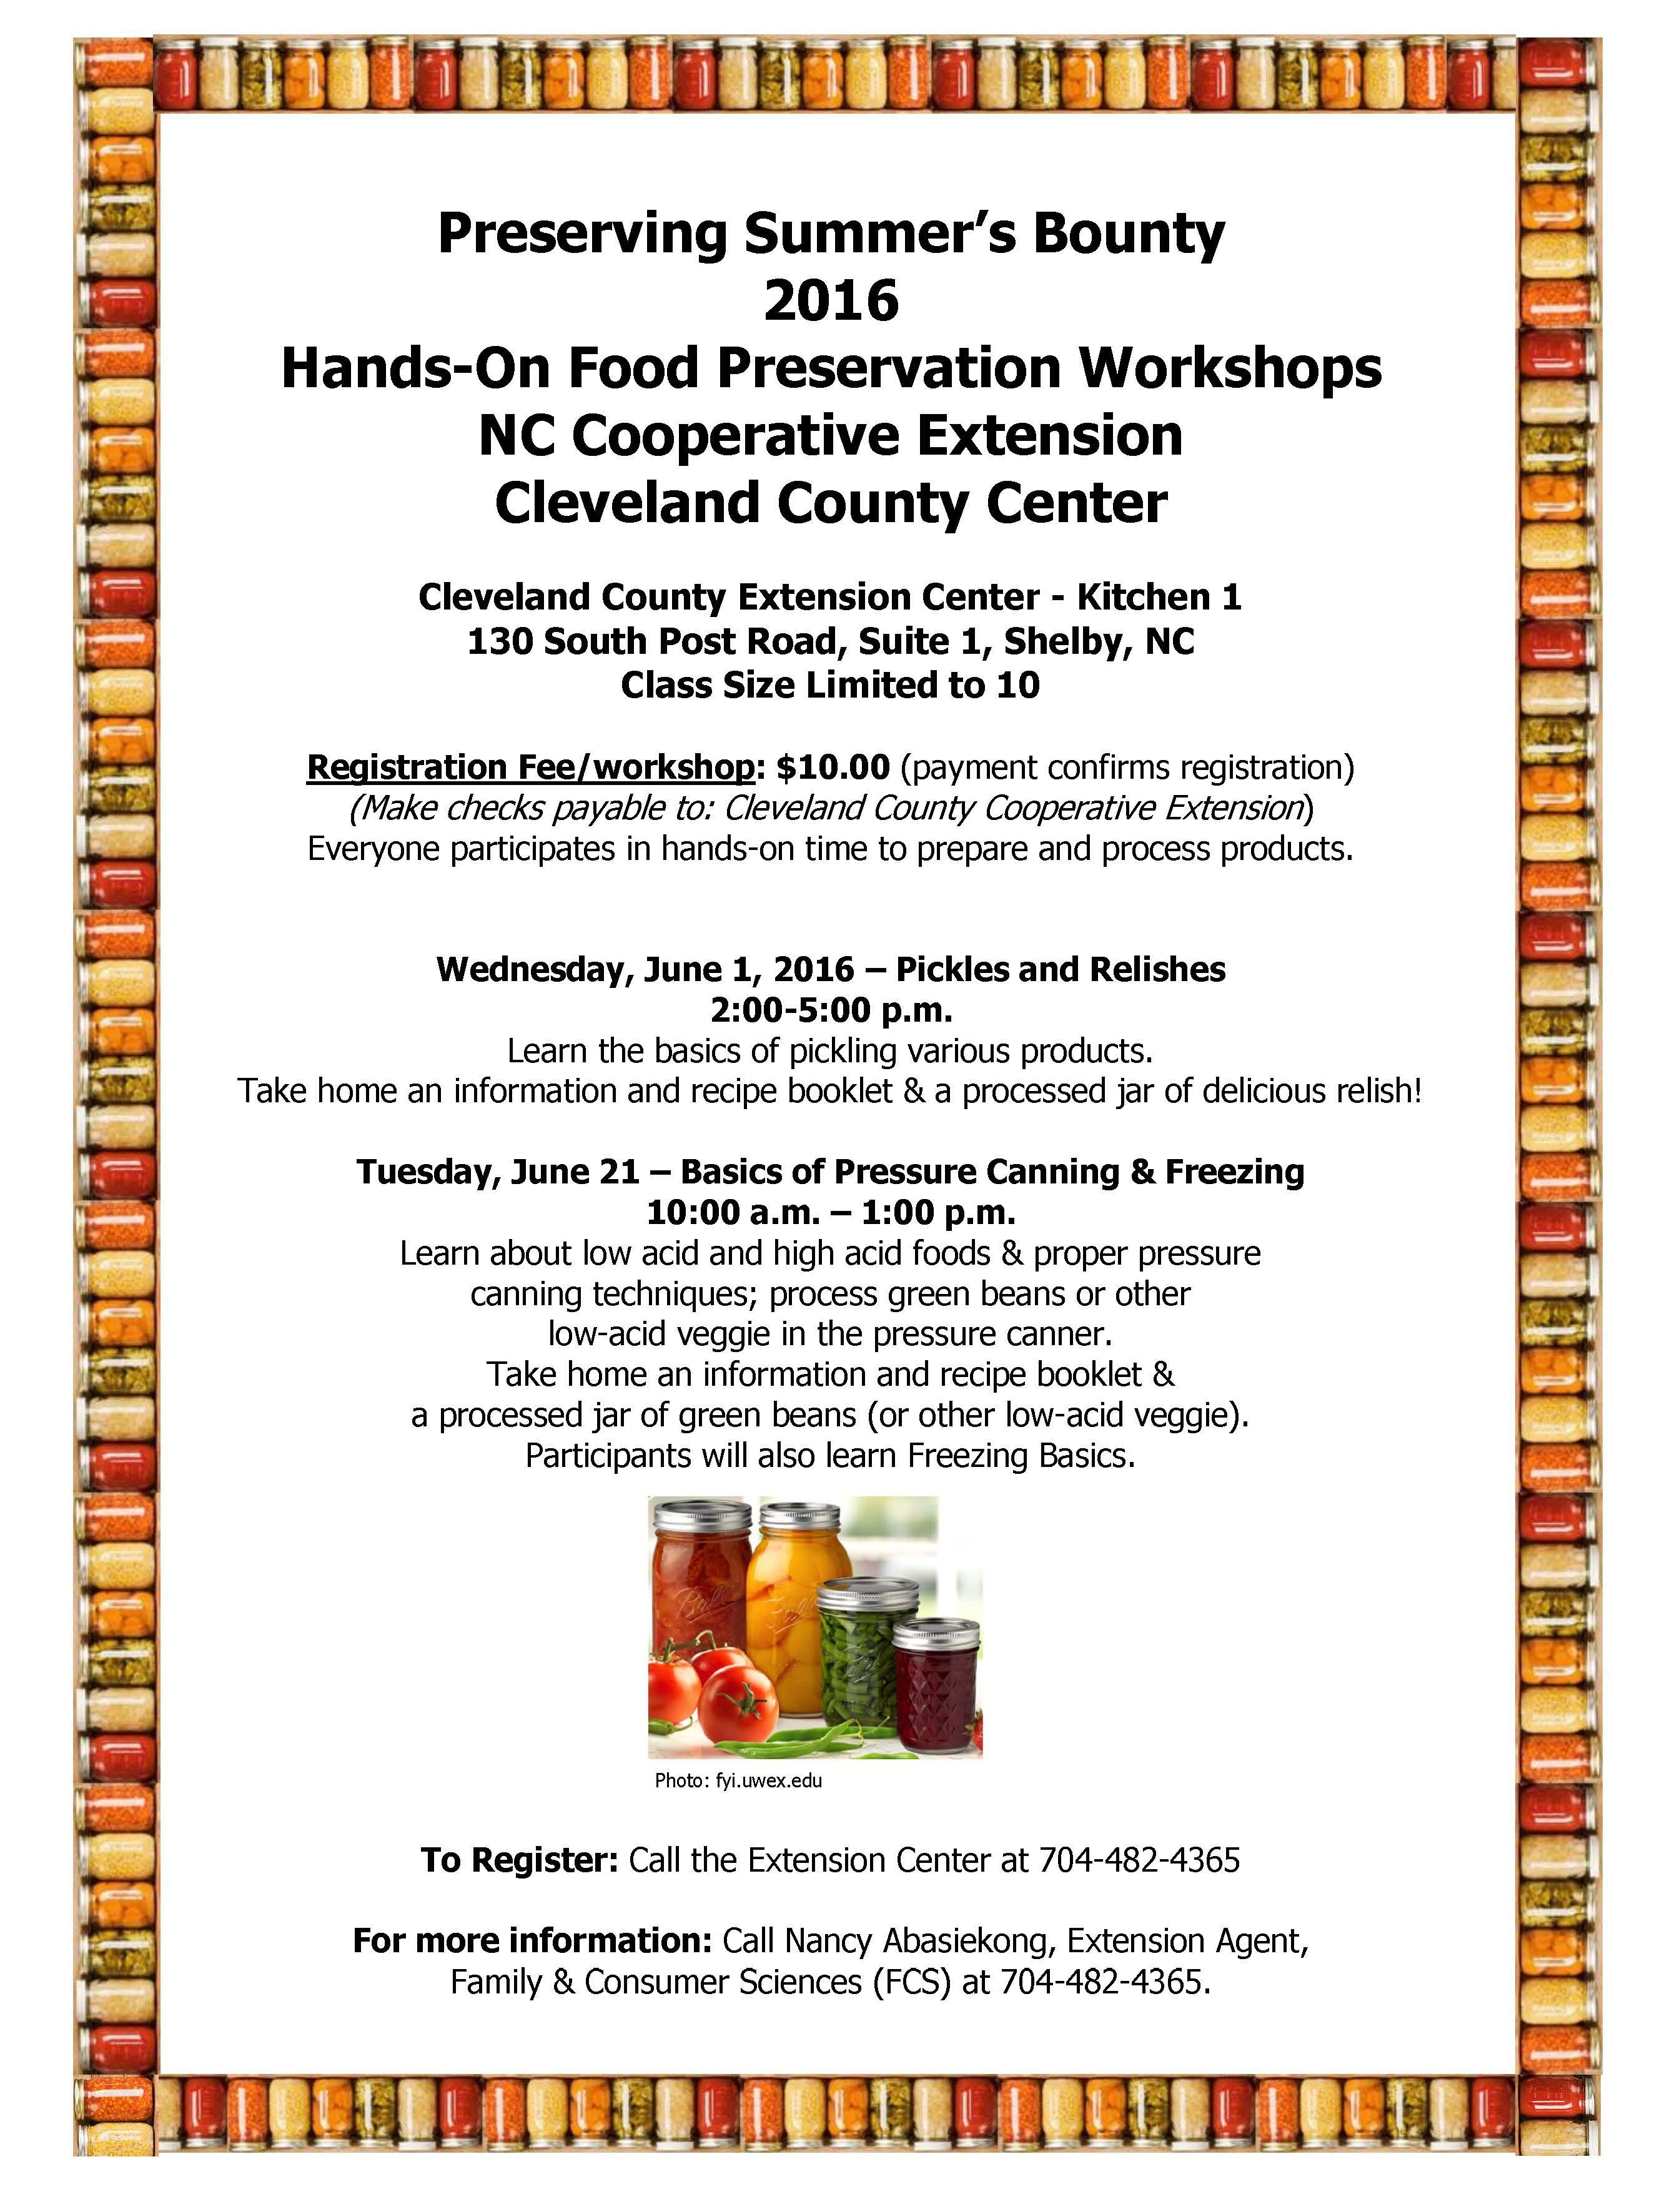 Food preservation classes offered north carolina cooperative extension food preservation flyer 2016 8x11 forumfinder Images